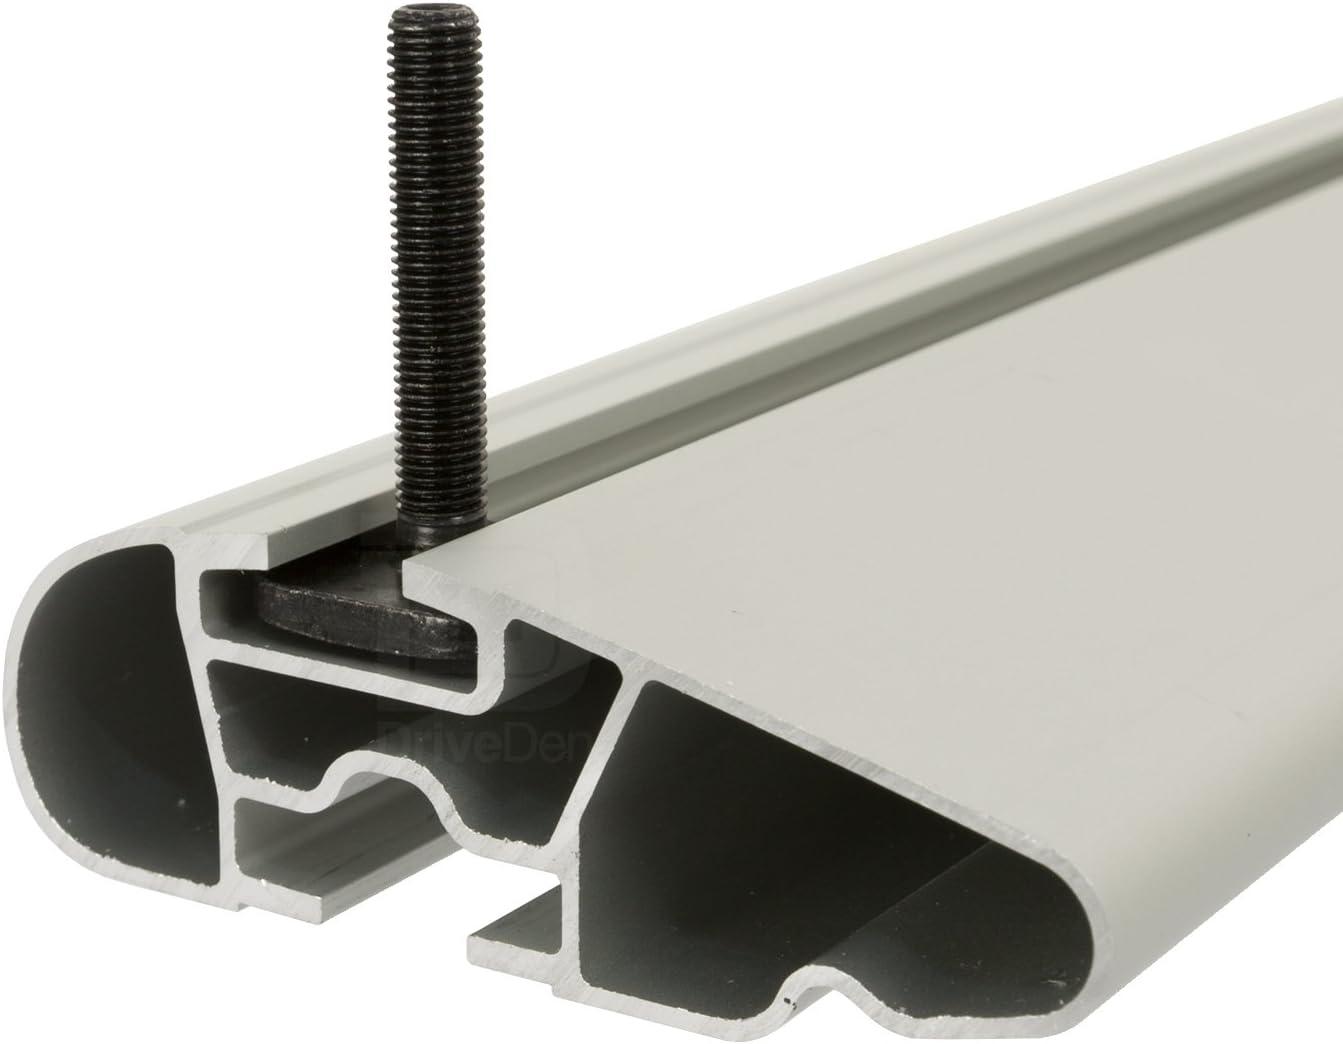 Farad Compact Pro FA-COMP-047b Aluminium Silver Wing Roof Bar Set Closed Roof Rails